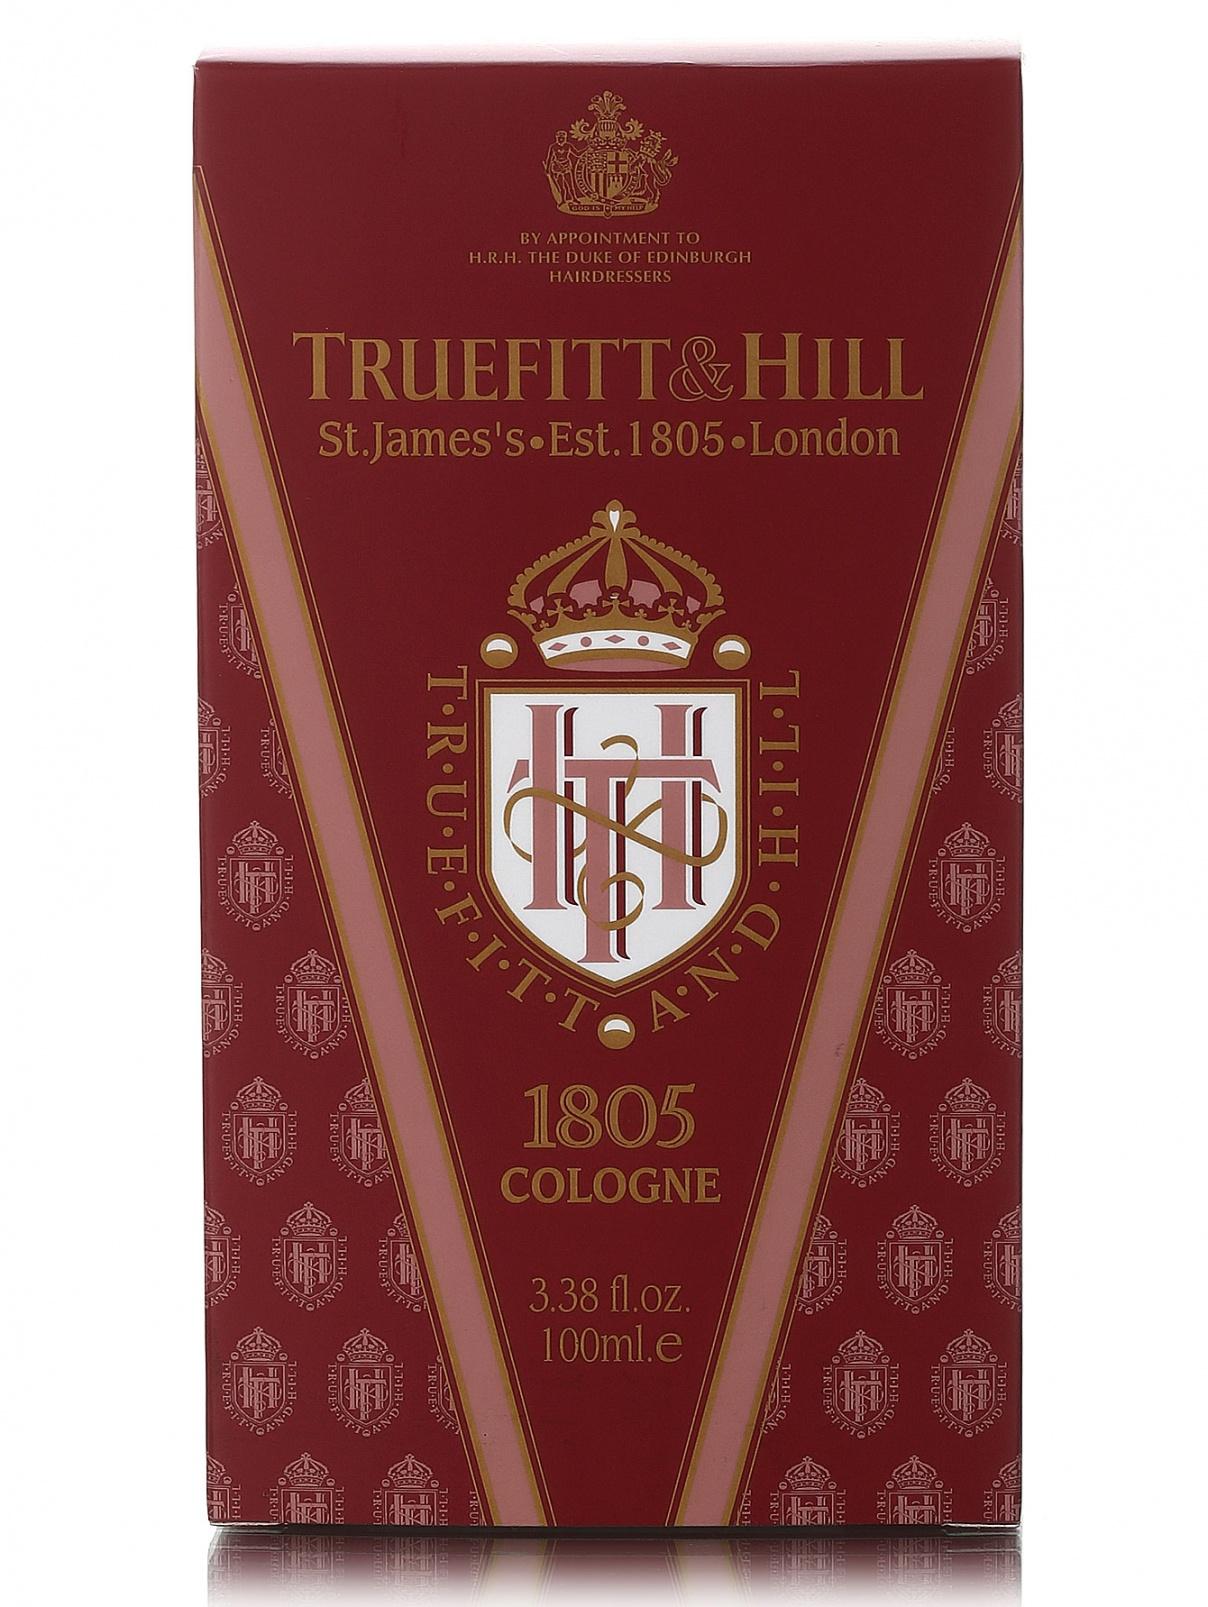 Одеколон - 1805, 100ml Truefitt & Hill  –  Модель Общий вид